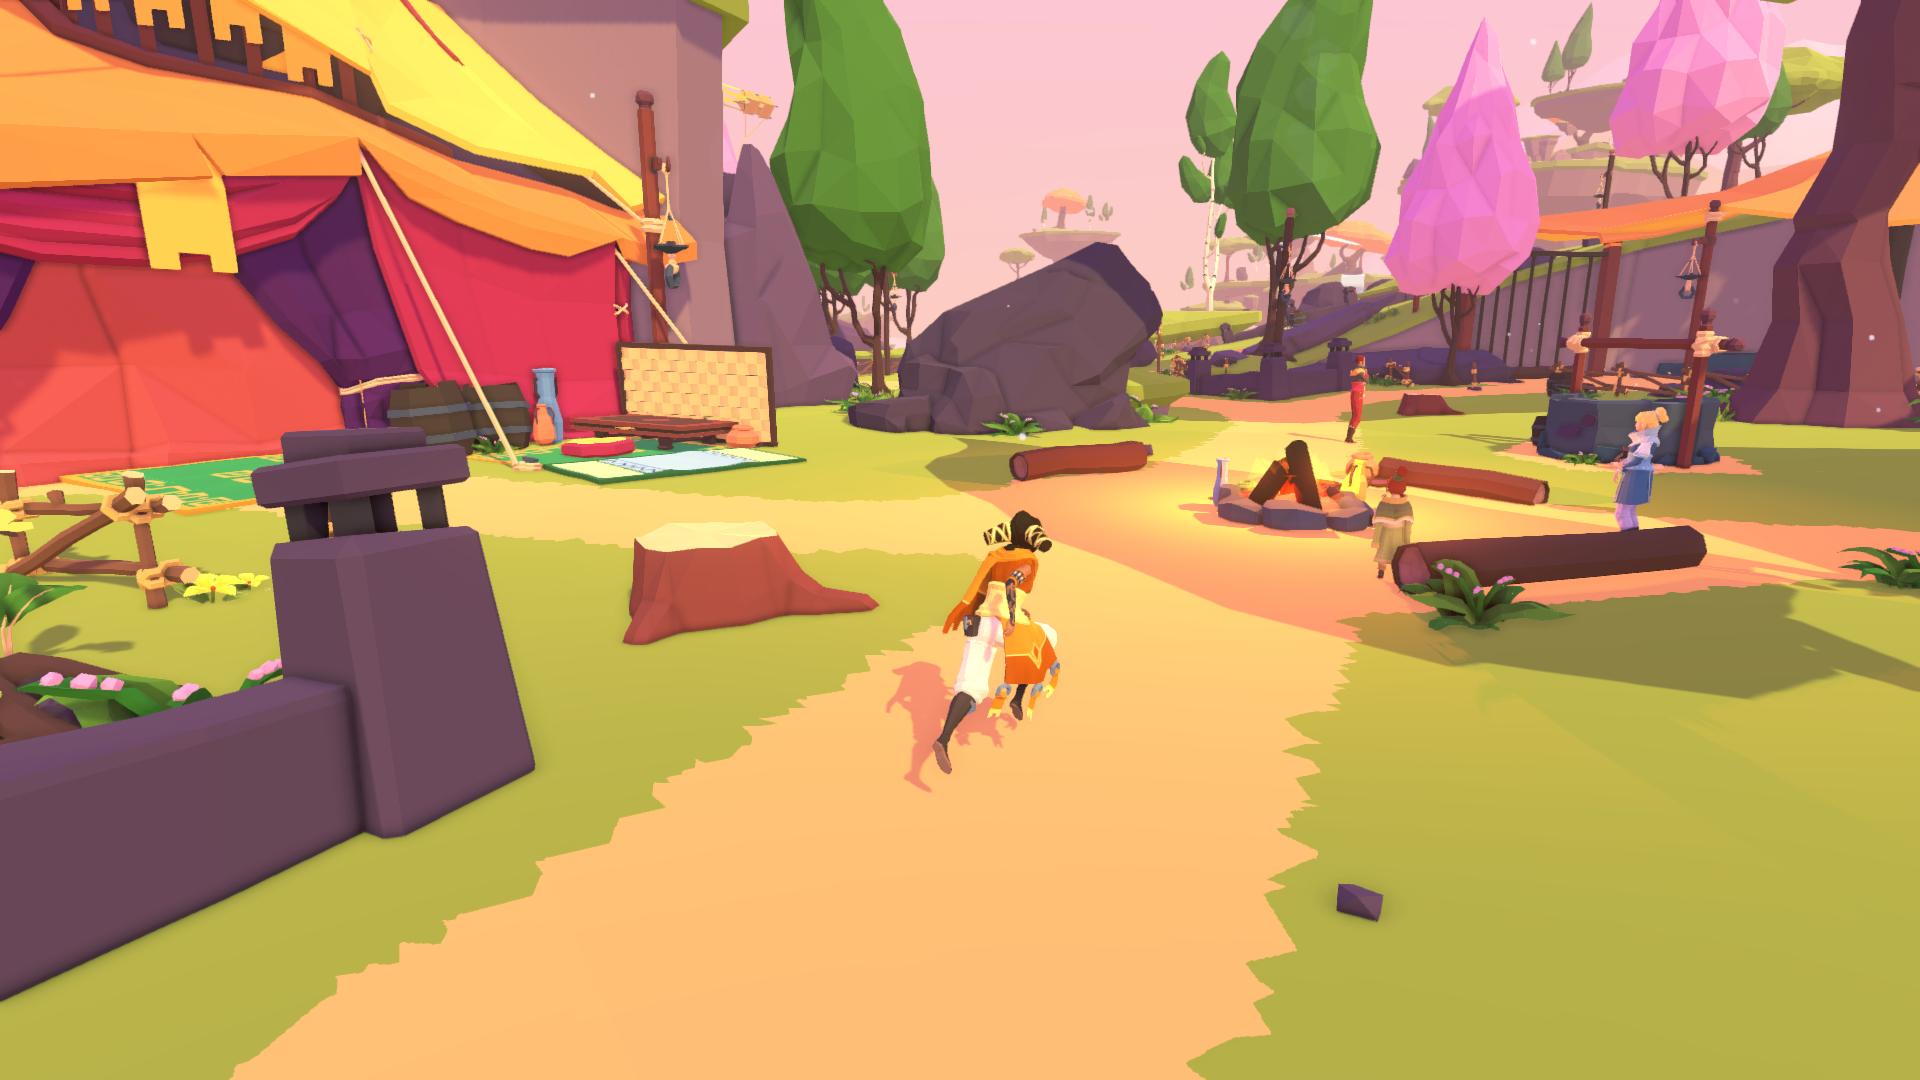 AER_Gamescom2016_Village